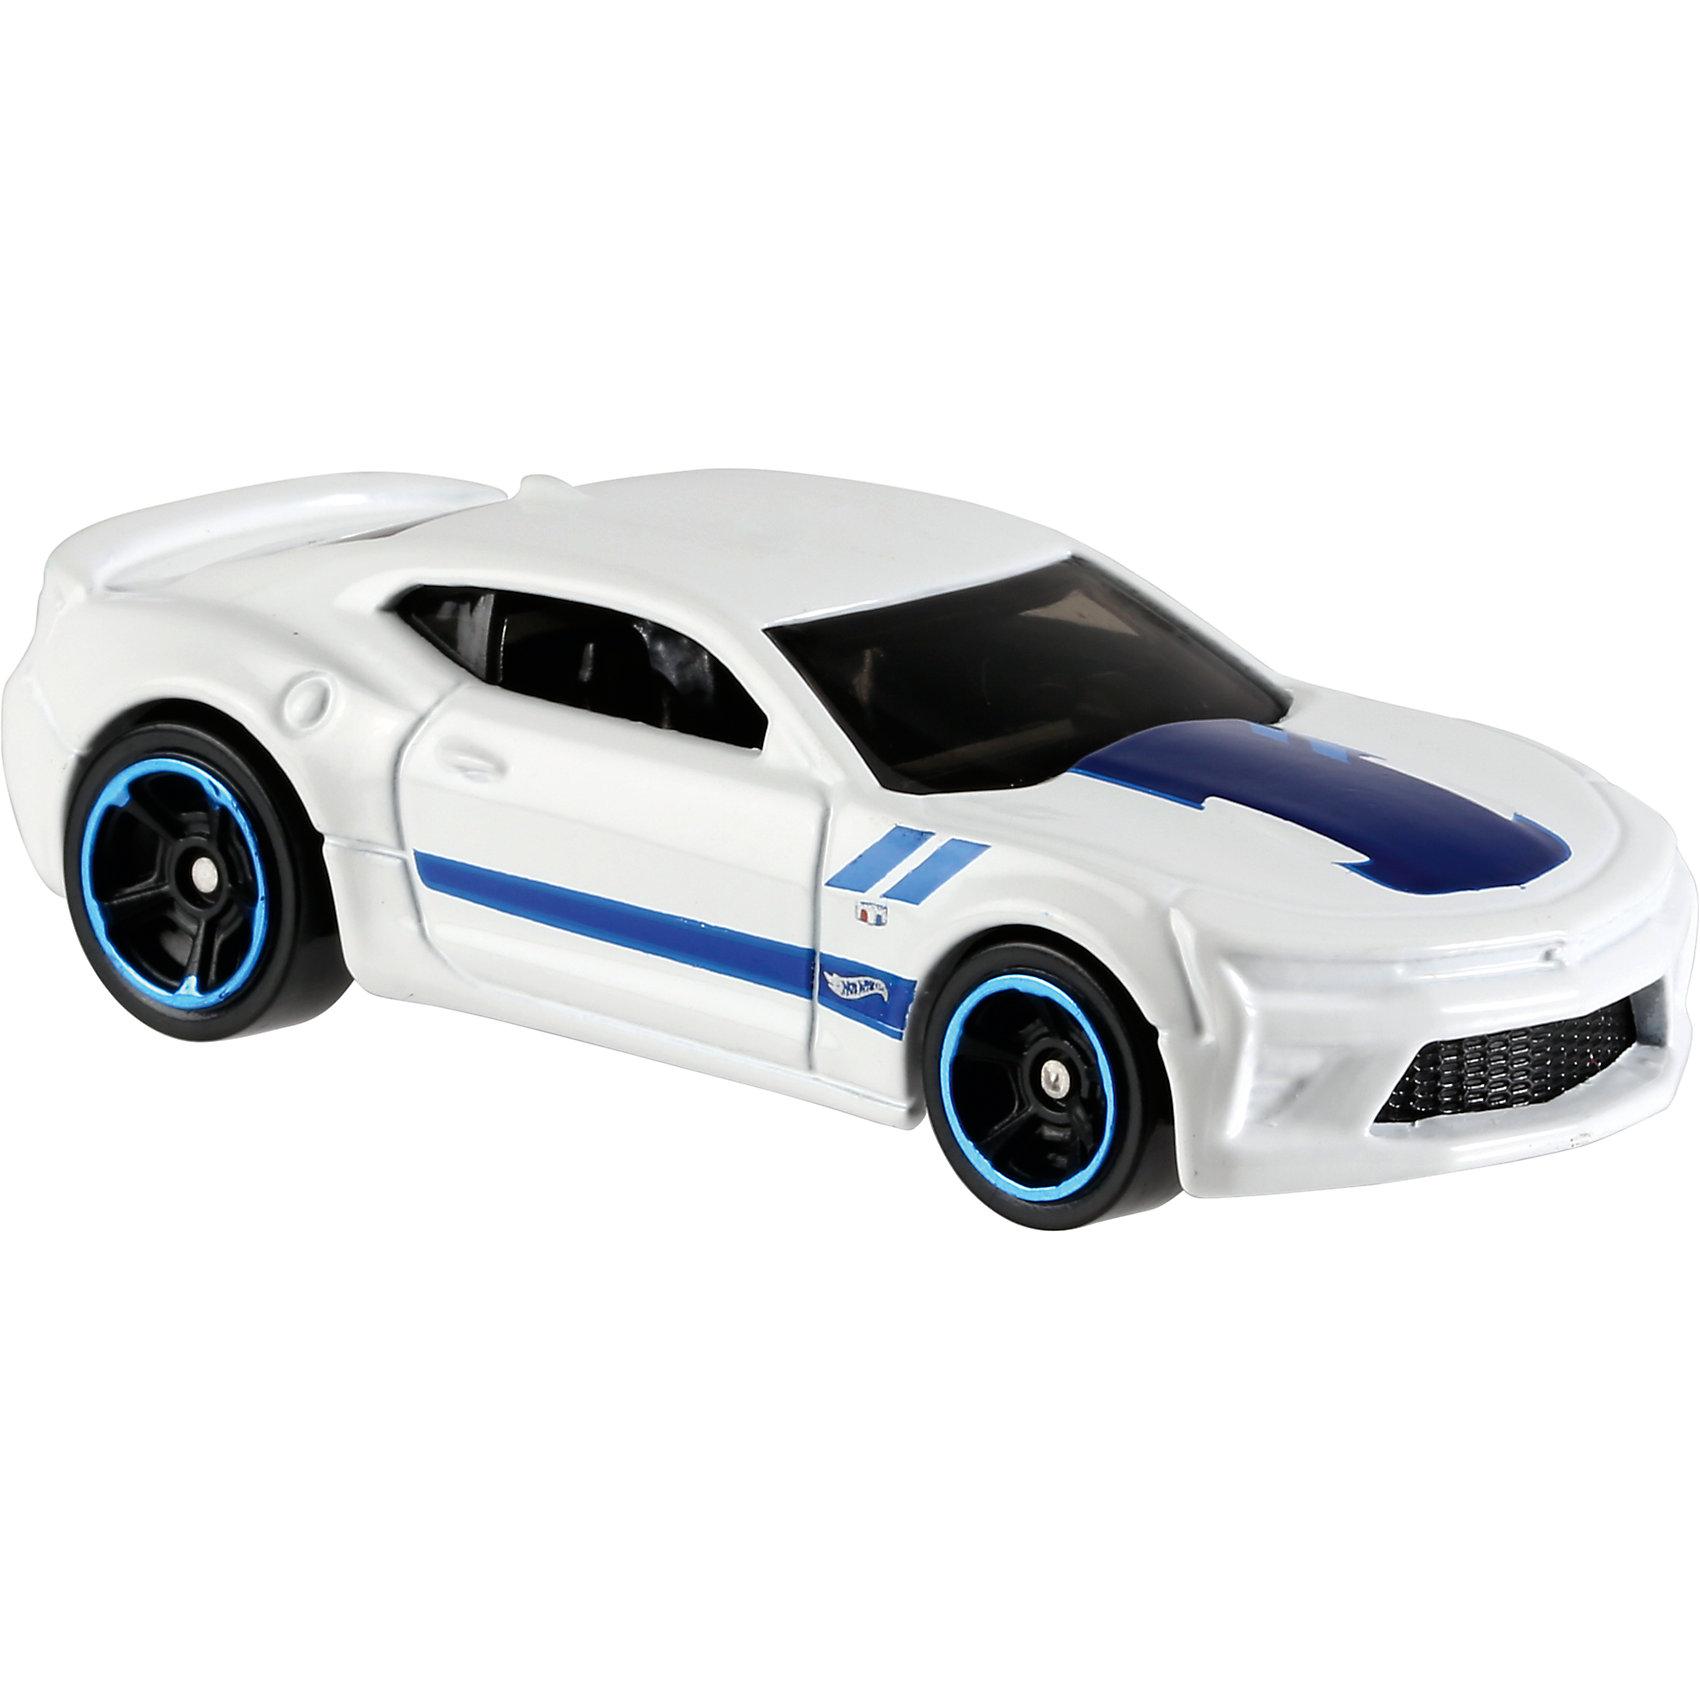 Базовая машинка Hot Wheels, 16 Camaro SSПопулярные игрушки<br><br><br>Ширина мм: 110<br>Глубина мм: 45<br>Высота мм: 110<br>Вес г: 30<br>Возраст от месяцев: 36<br>Возраст до месяцев: 96<br>Пол: Мужской<br>Возраст: Детский<br>SKU: 7111062